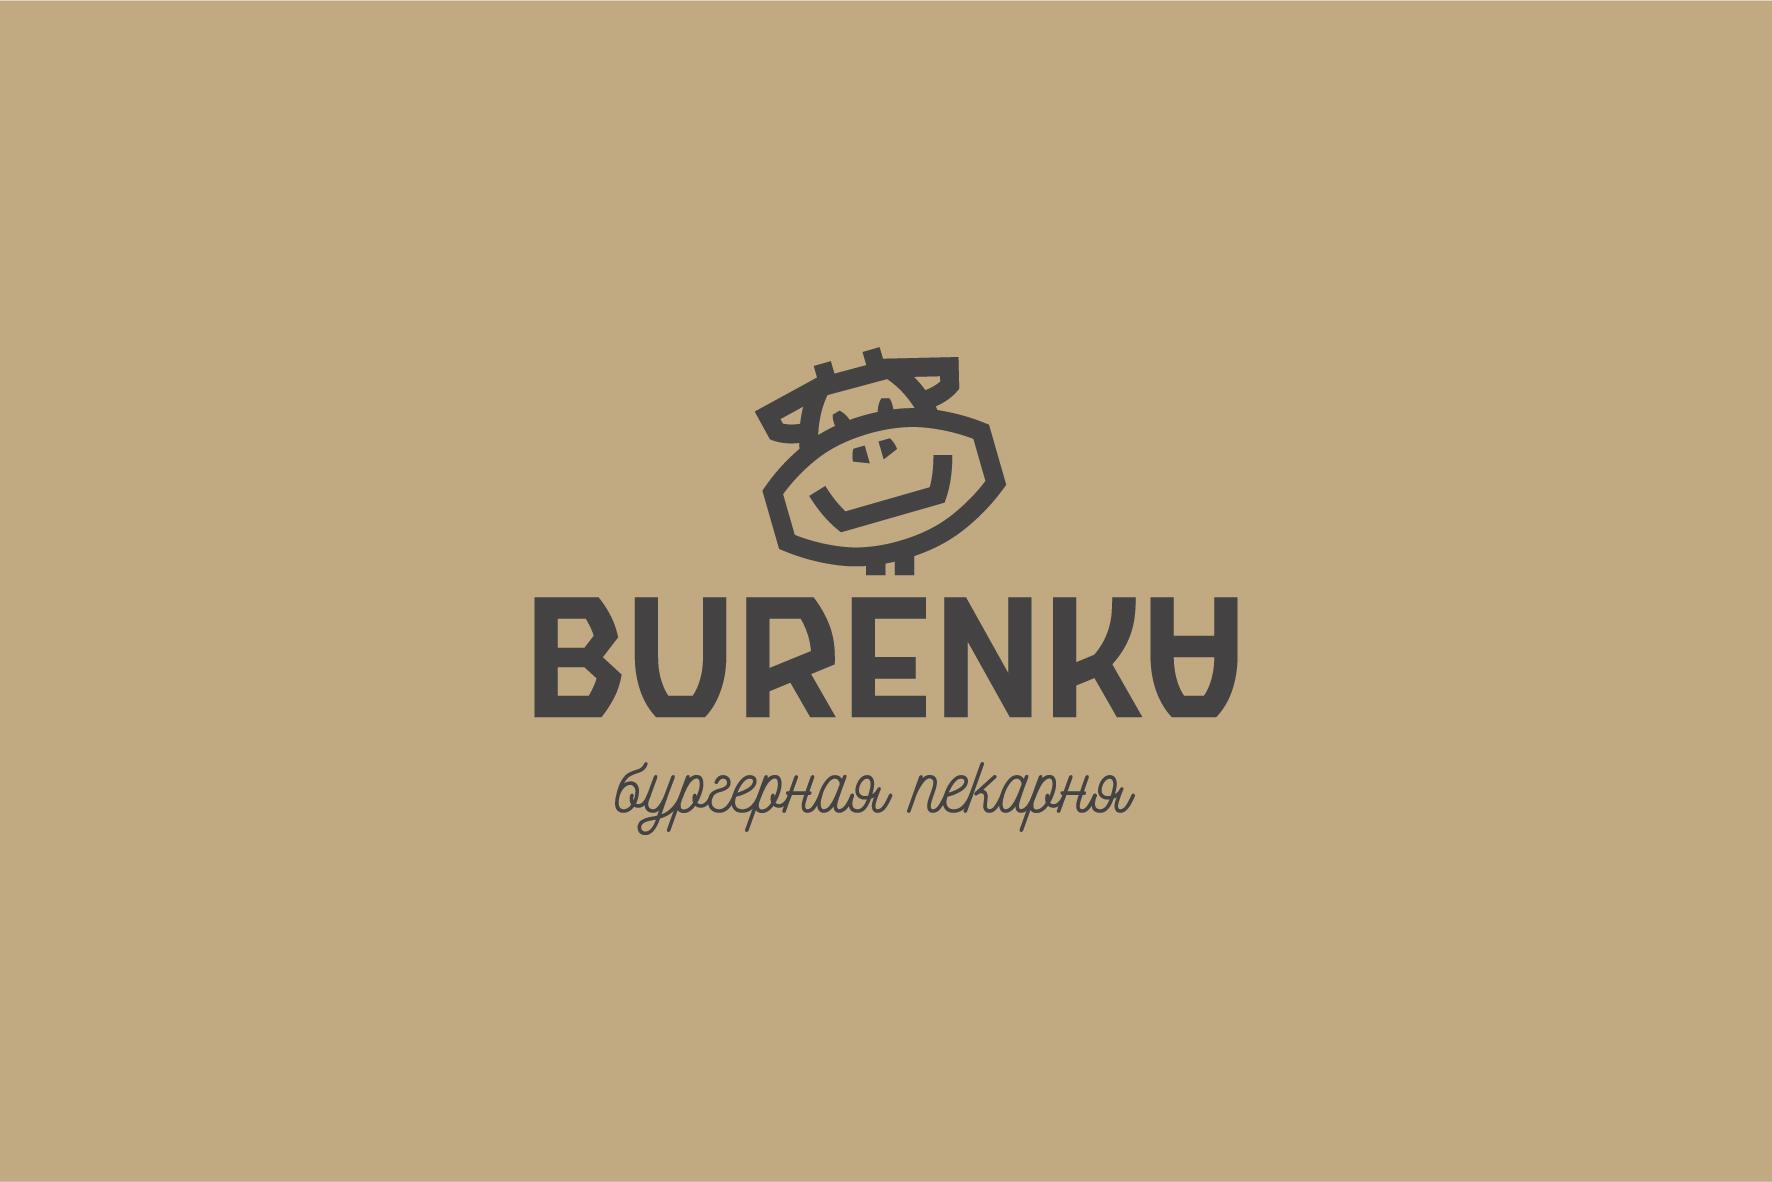 Логотип для Бургерной с Пекарней фото f_9045e151e80b5991.jpg